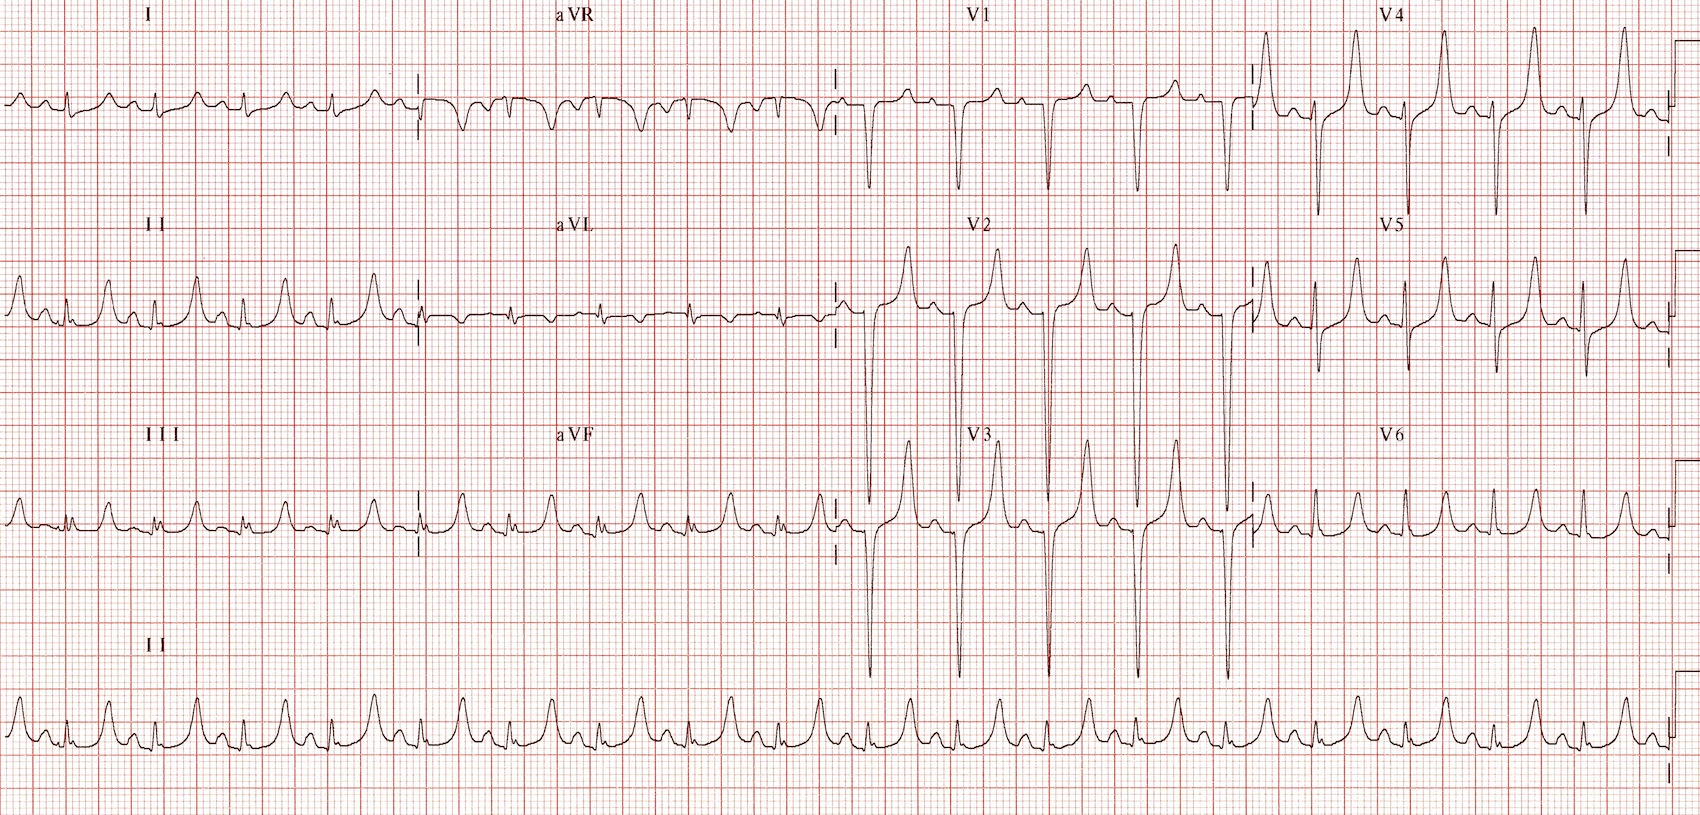 Electrocardiogram (EKG, ECG)